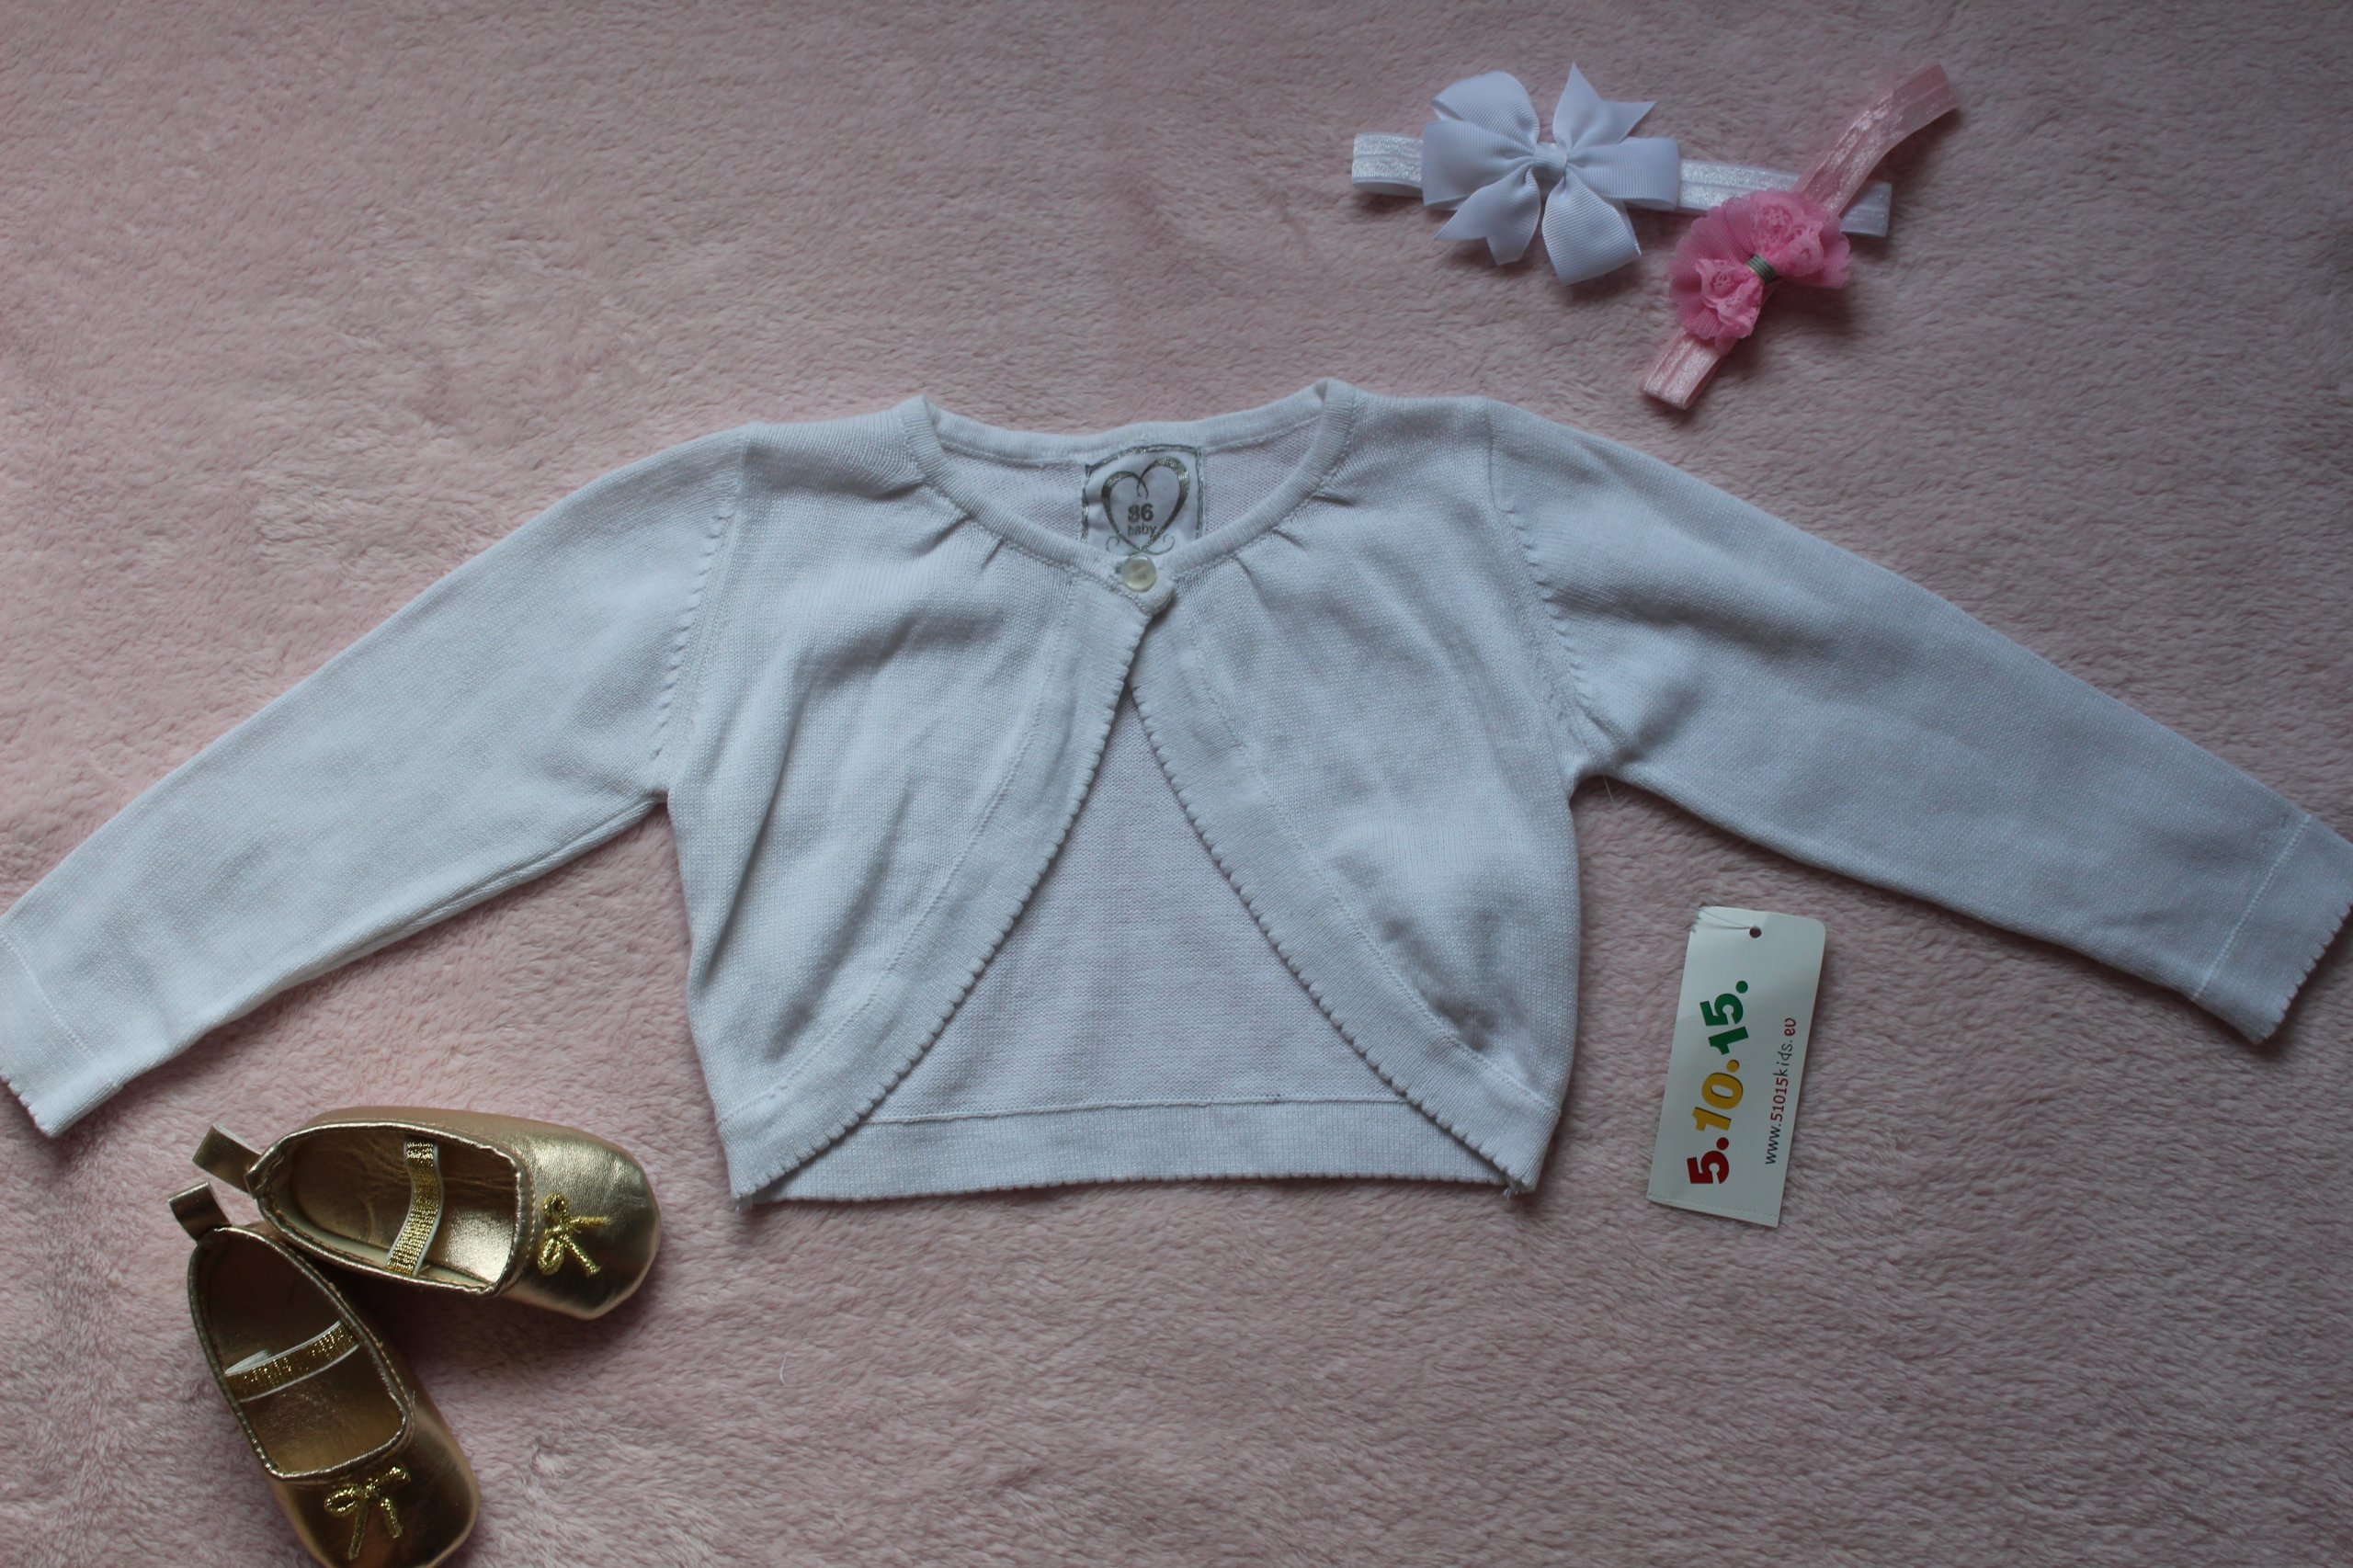 nowe 68 bolerko  5.10.15.  ŚLICZNE sweterek